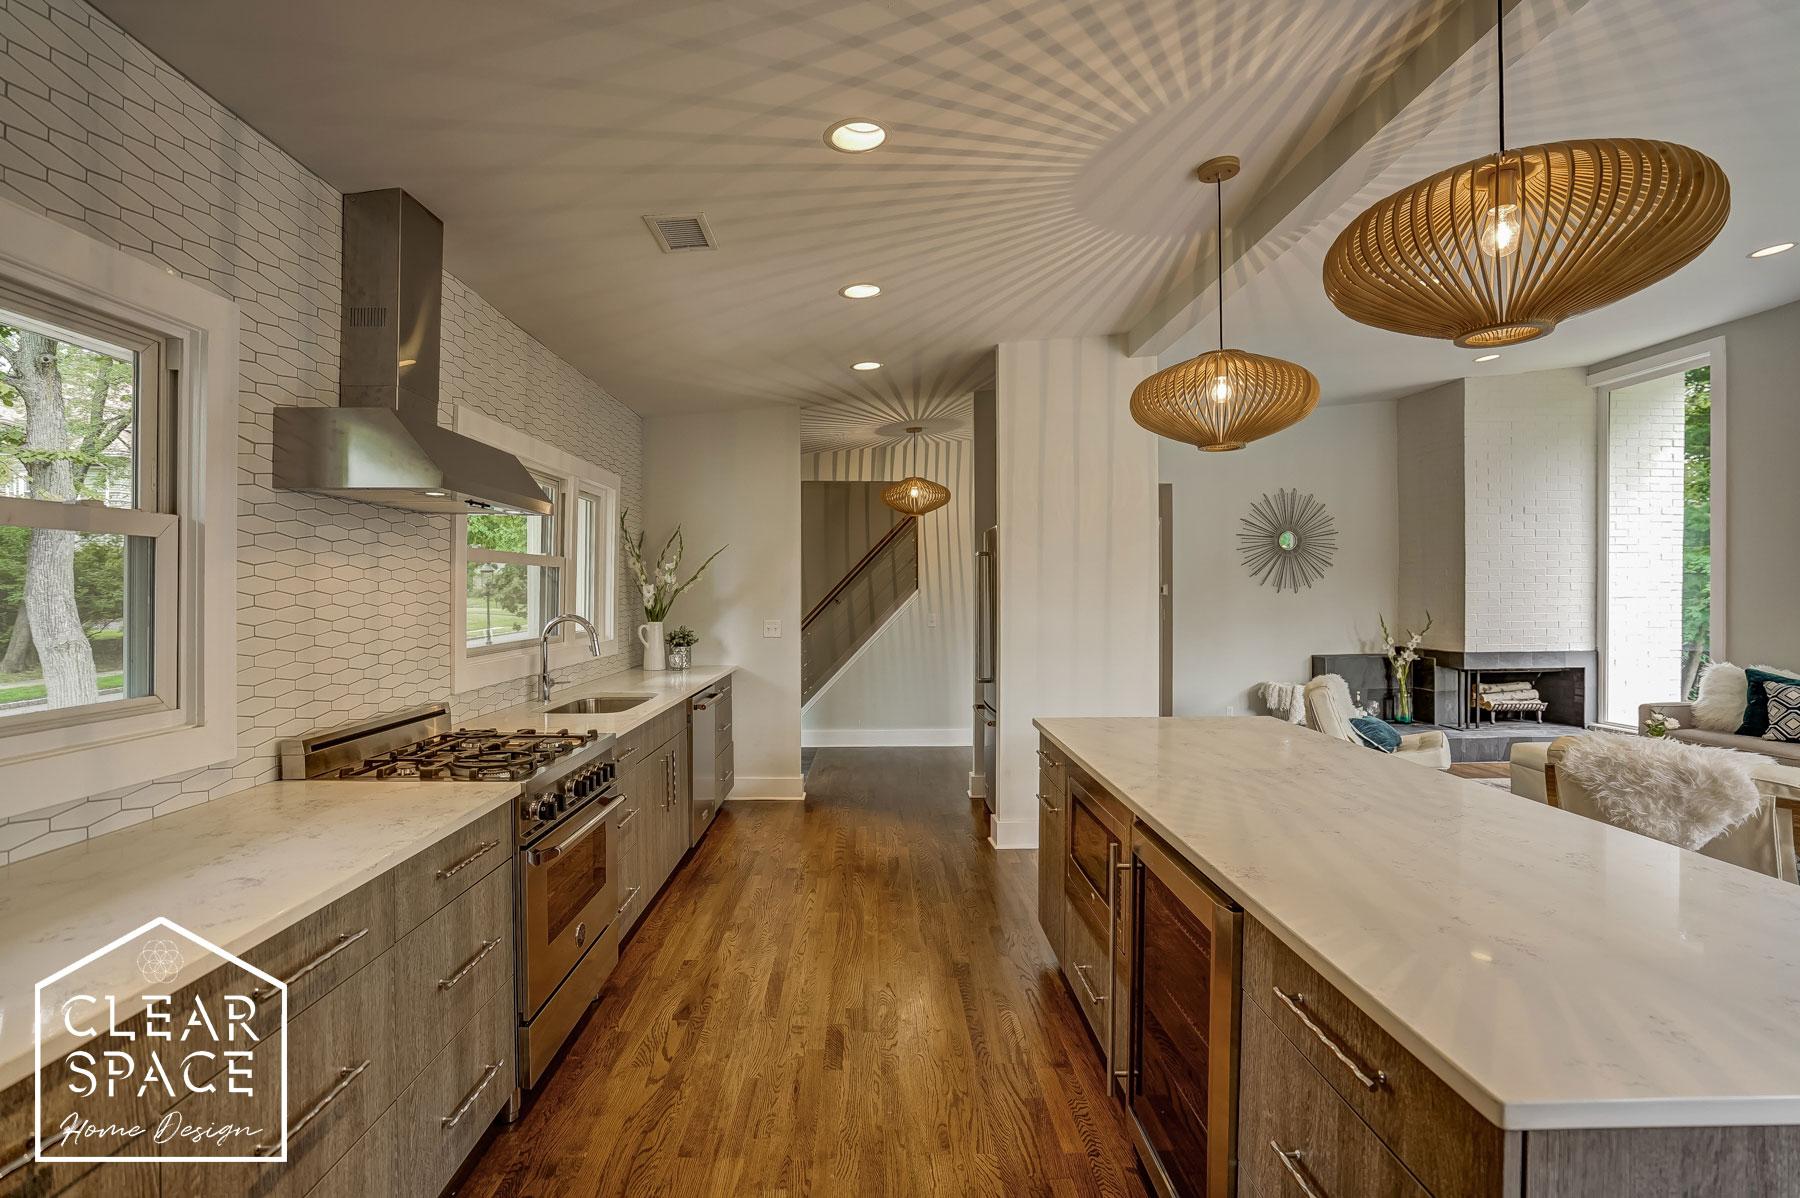 turrell_kitchen4.jpg